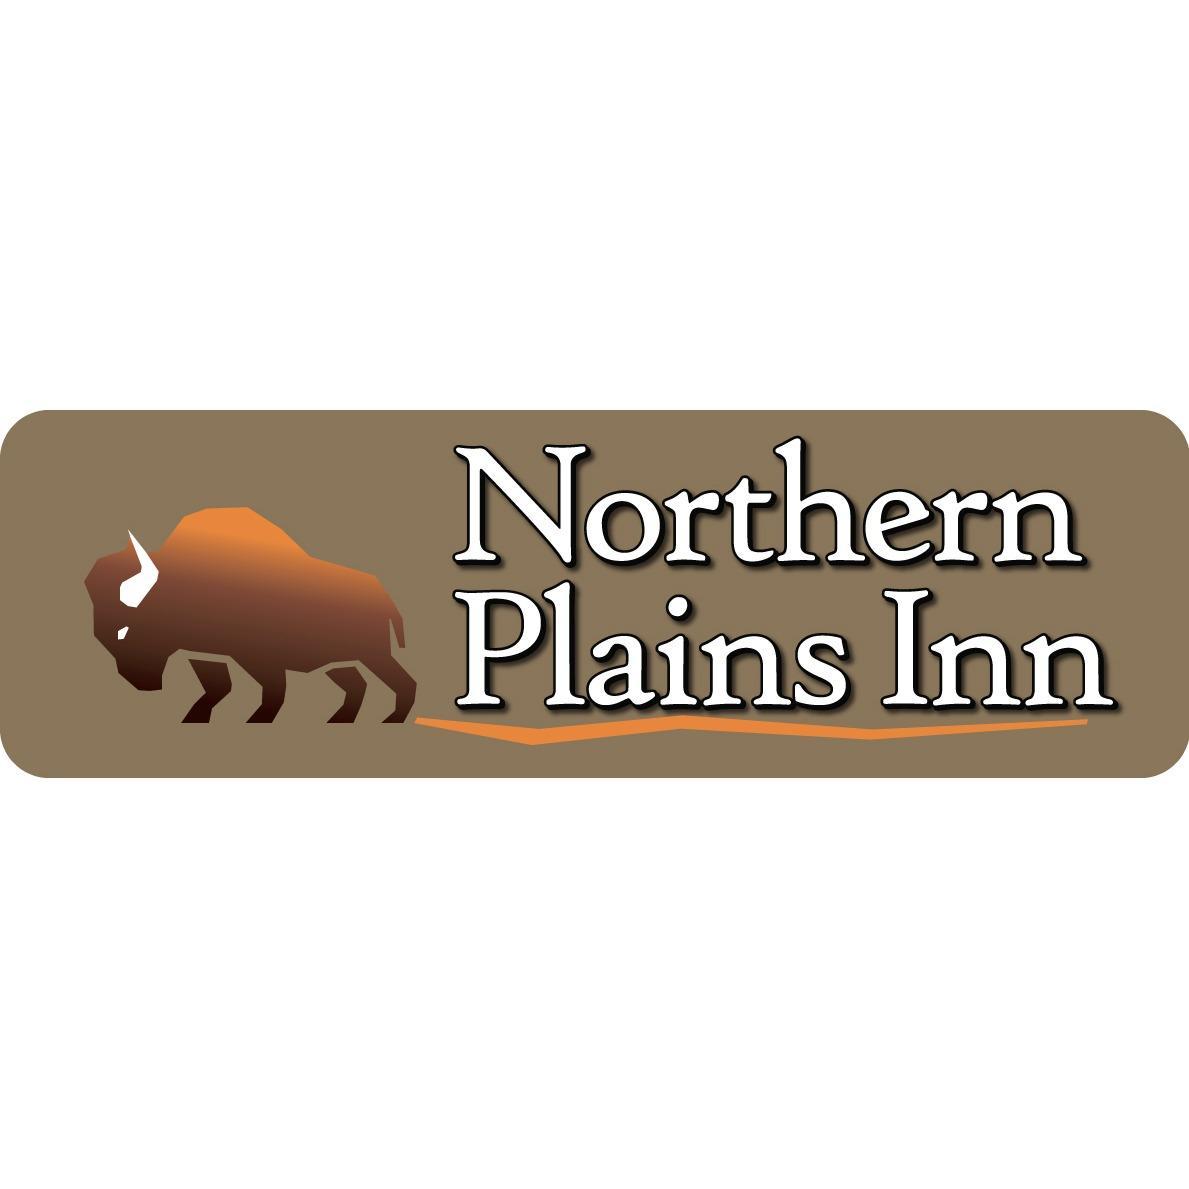 Northern Plains Inn